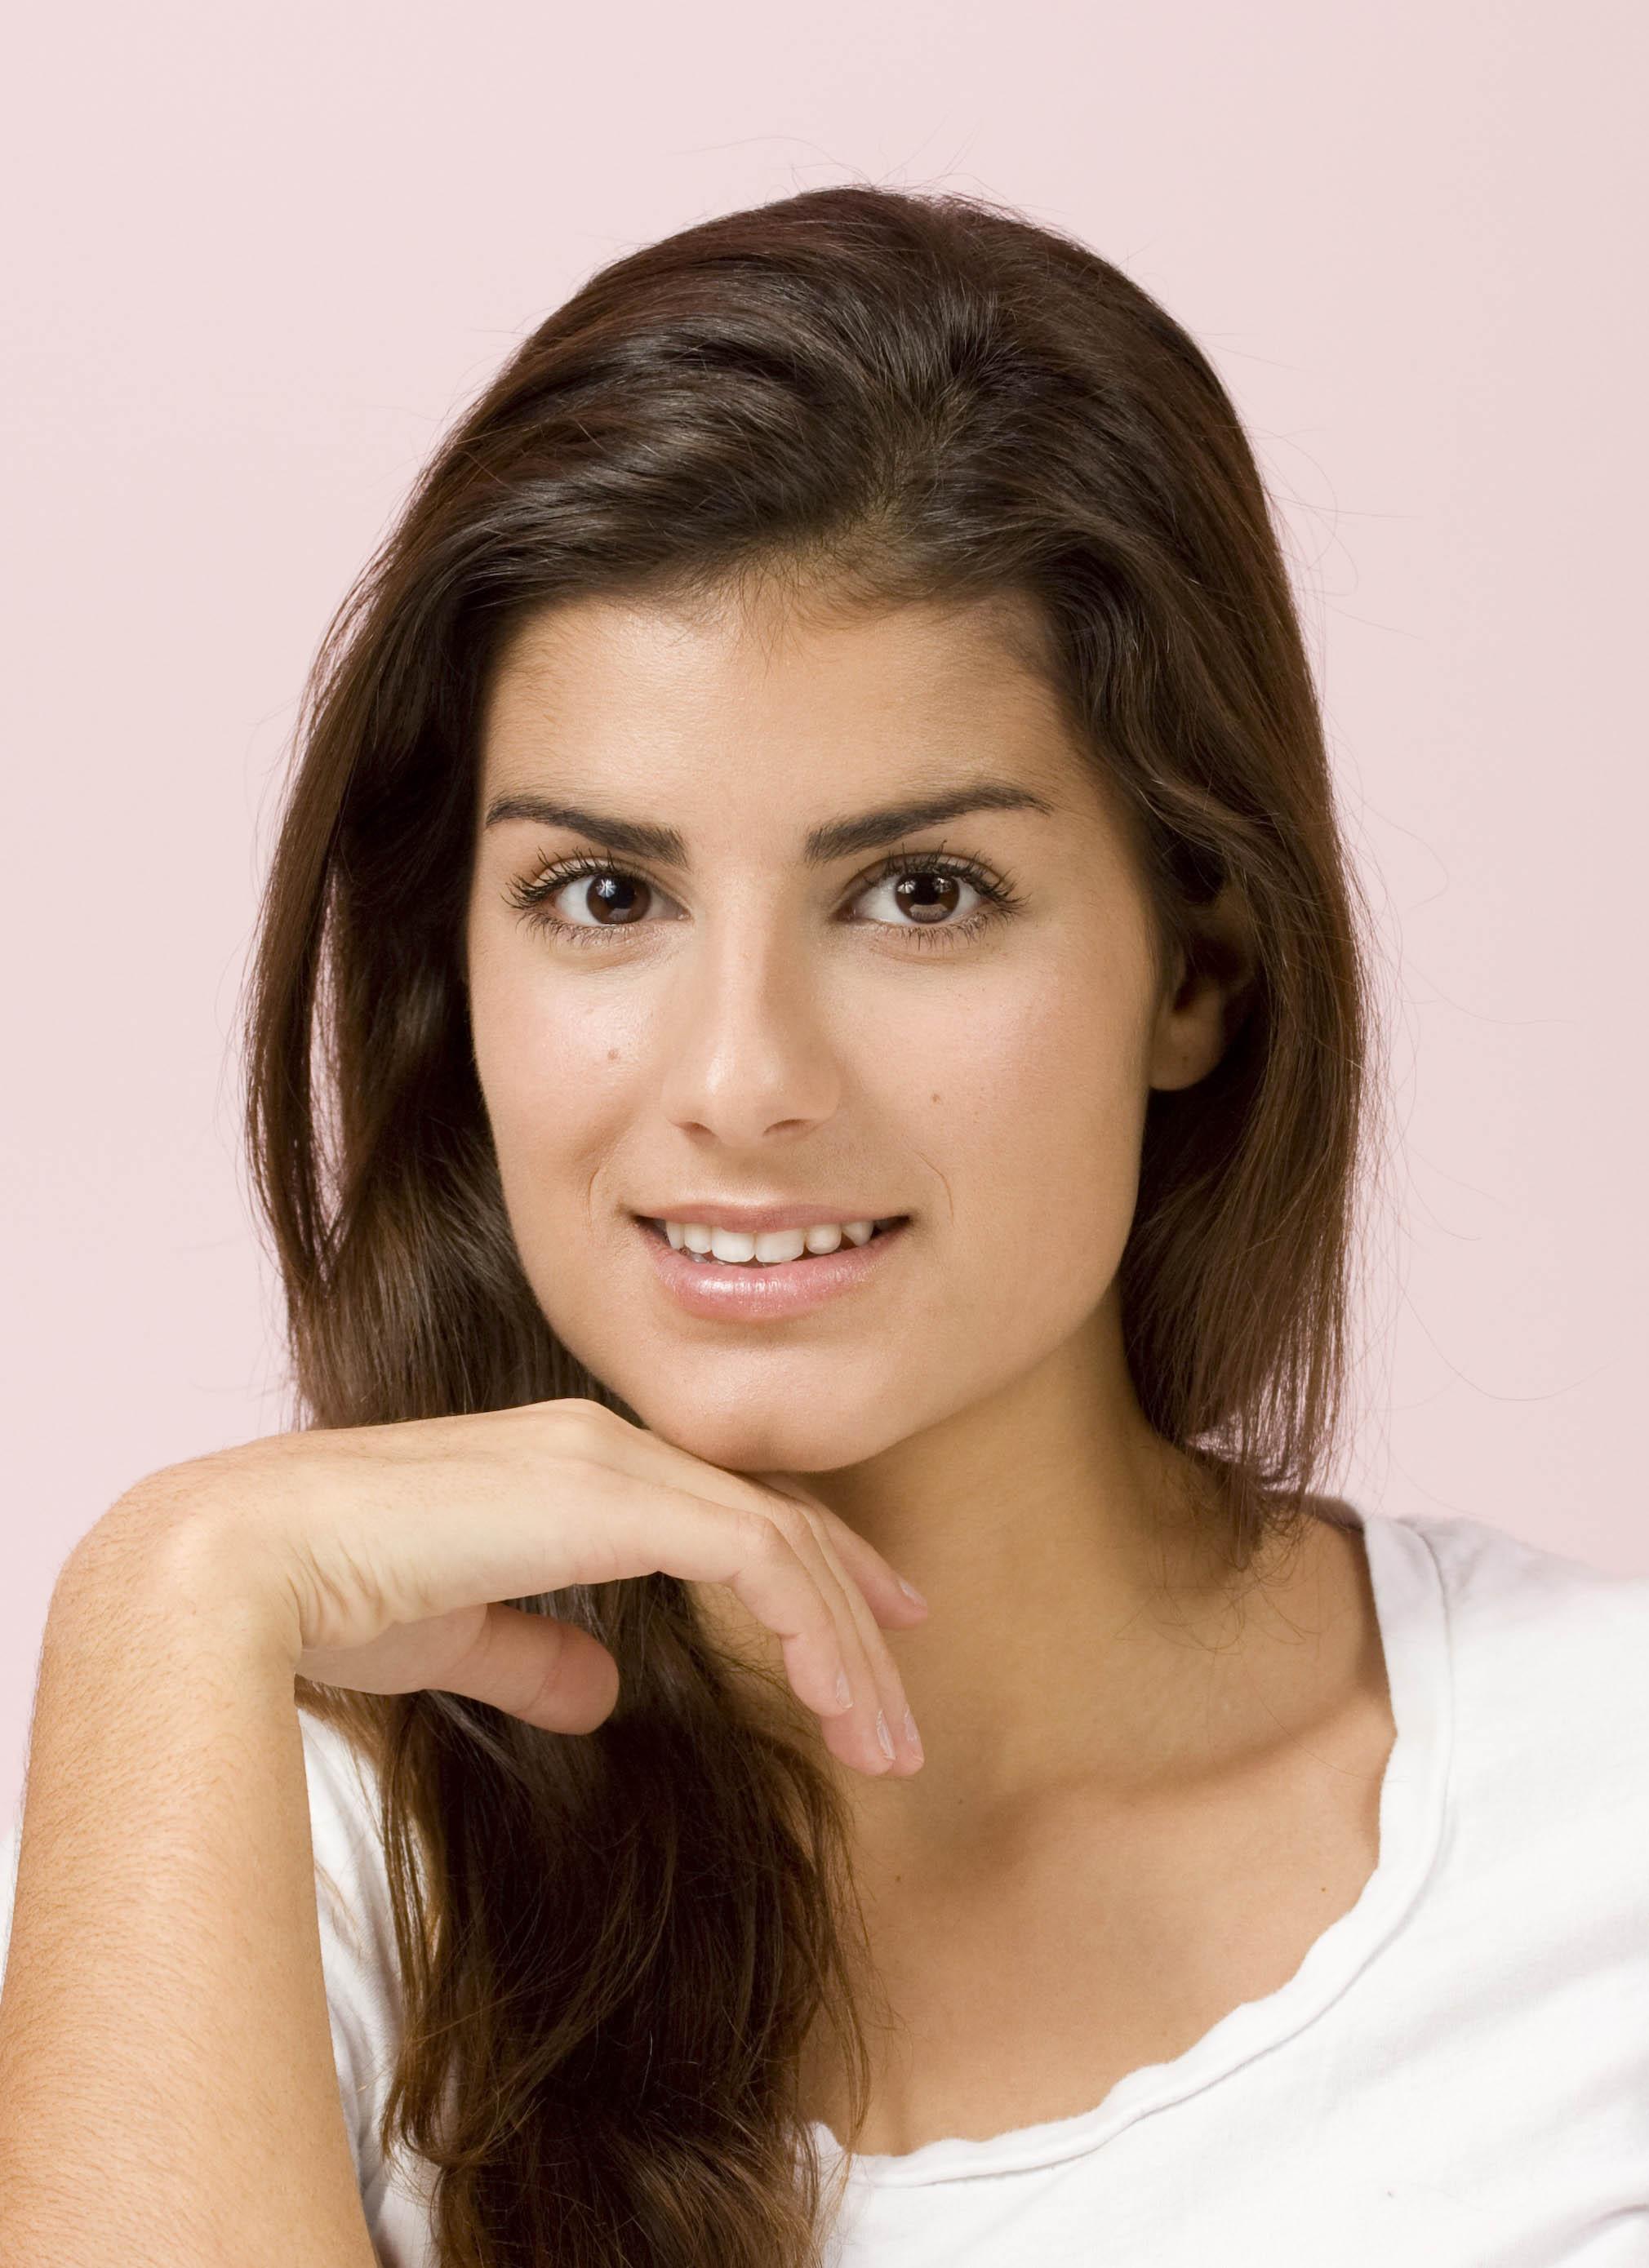 Orange Model Management Inc: Orange Models Success Stories